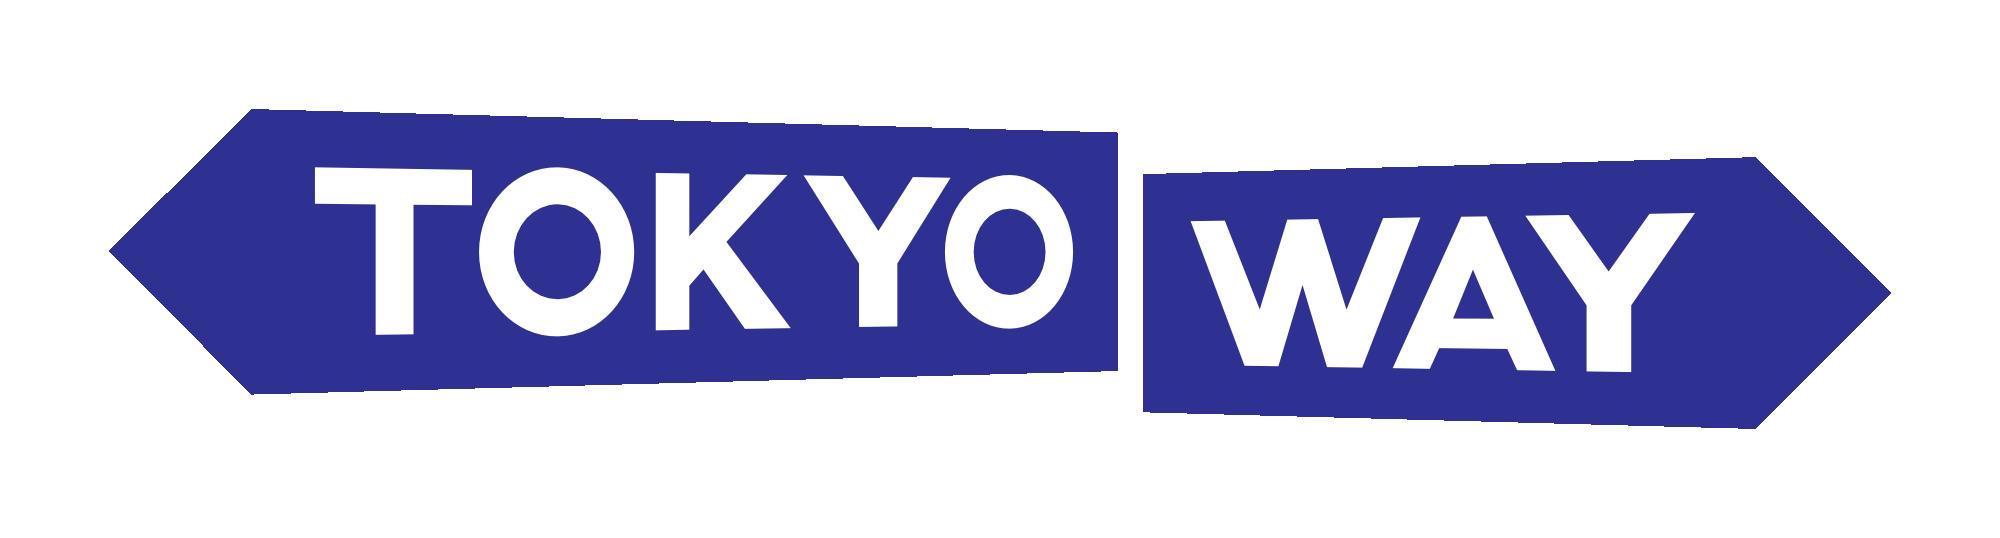 tokyowayロゴ